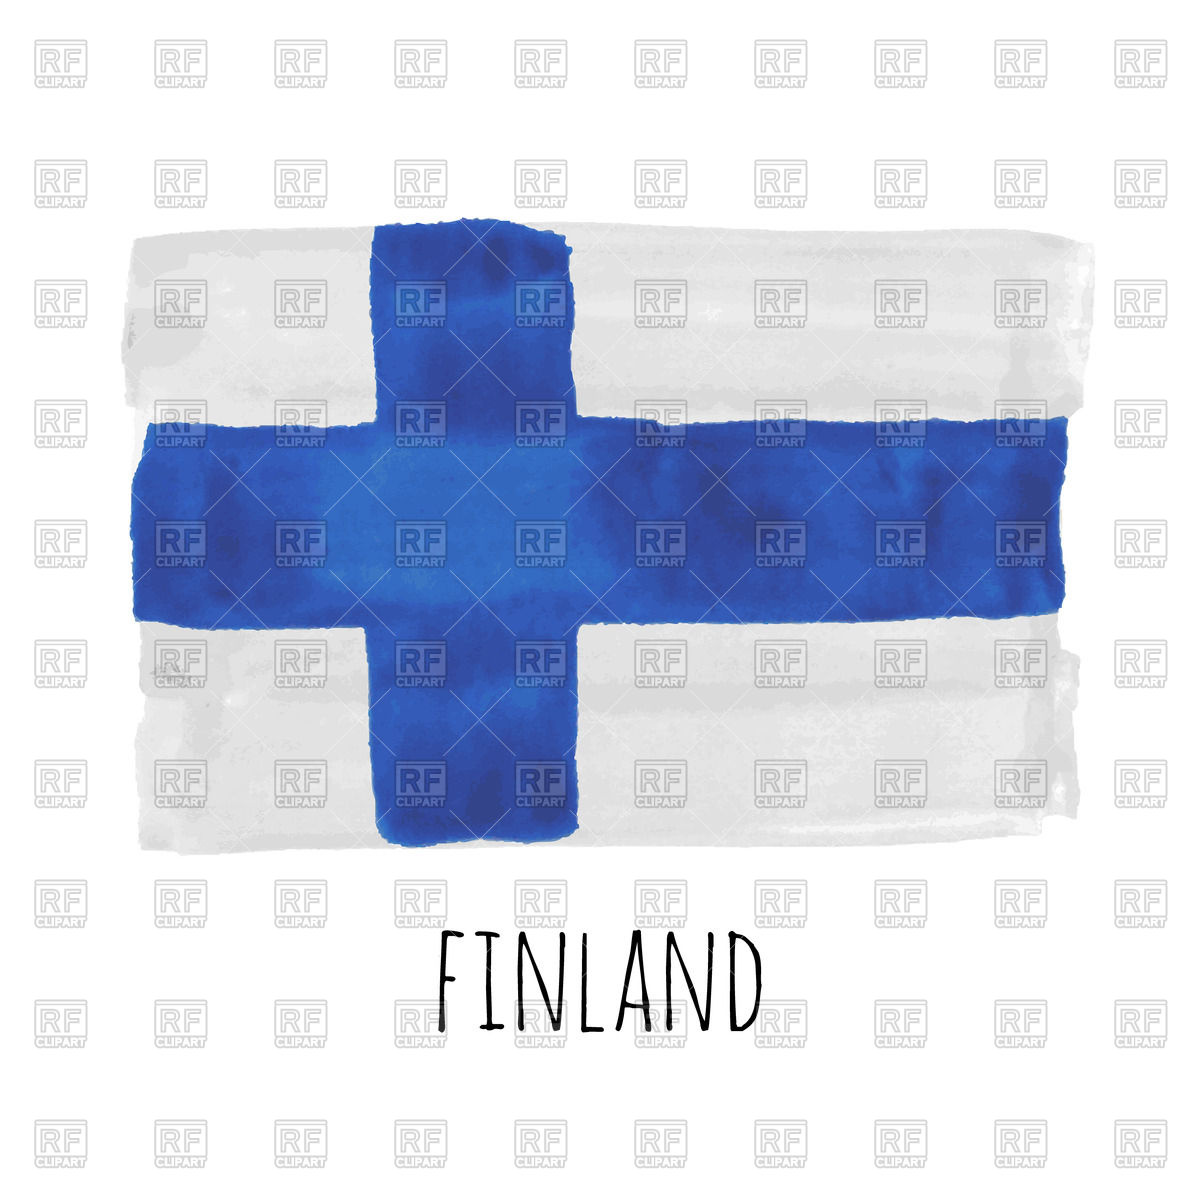 Hand drawn watercolor Finland flag Vector Image #70197.